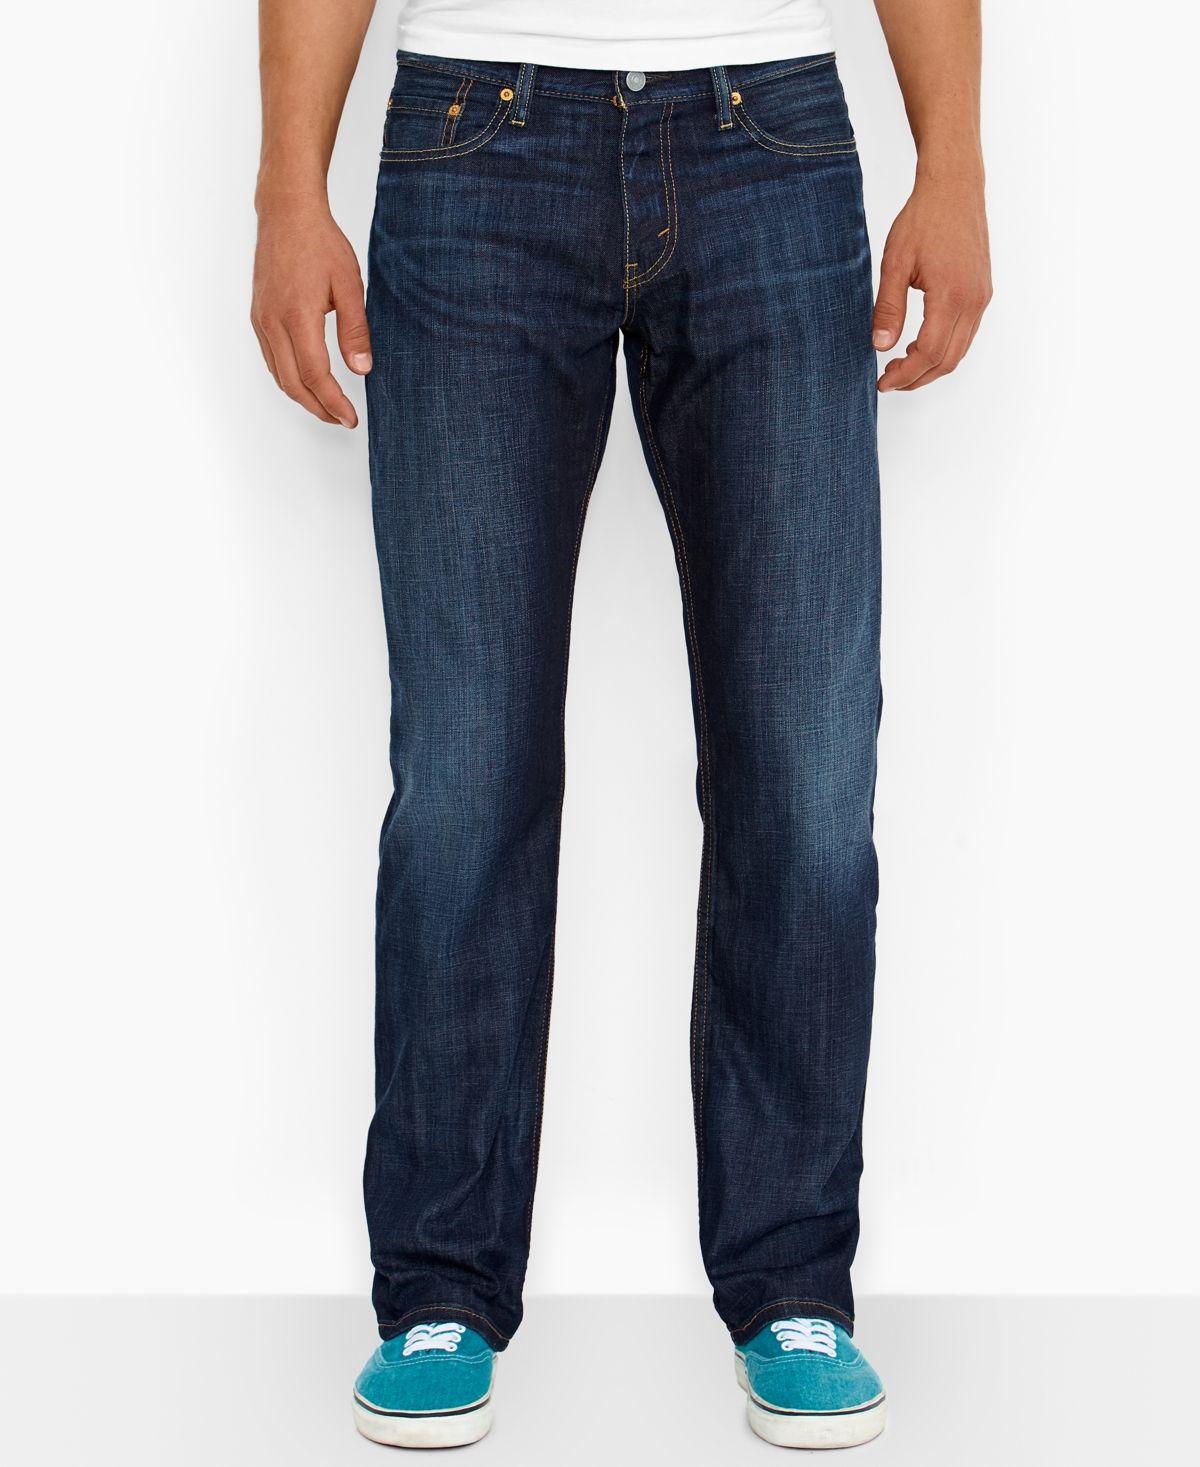 Levi's Men's 514 Straight Fit Jeans Shipyard Stretch